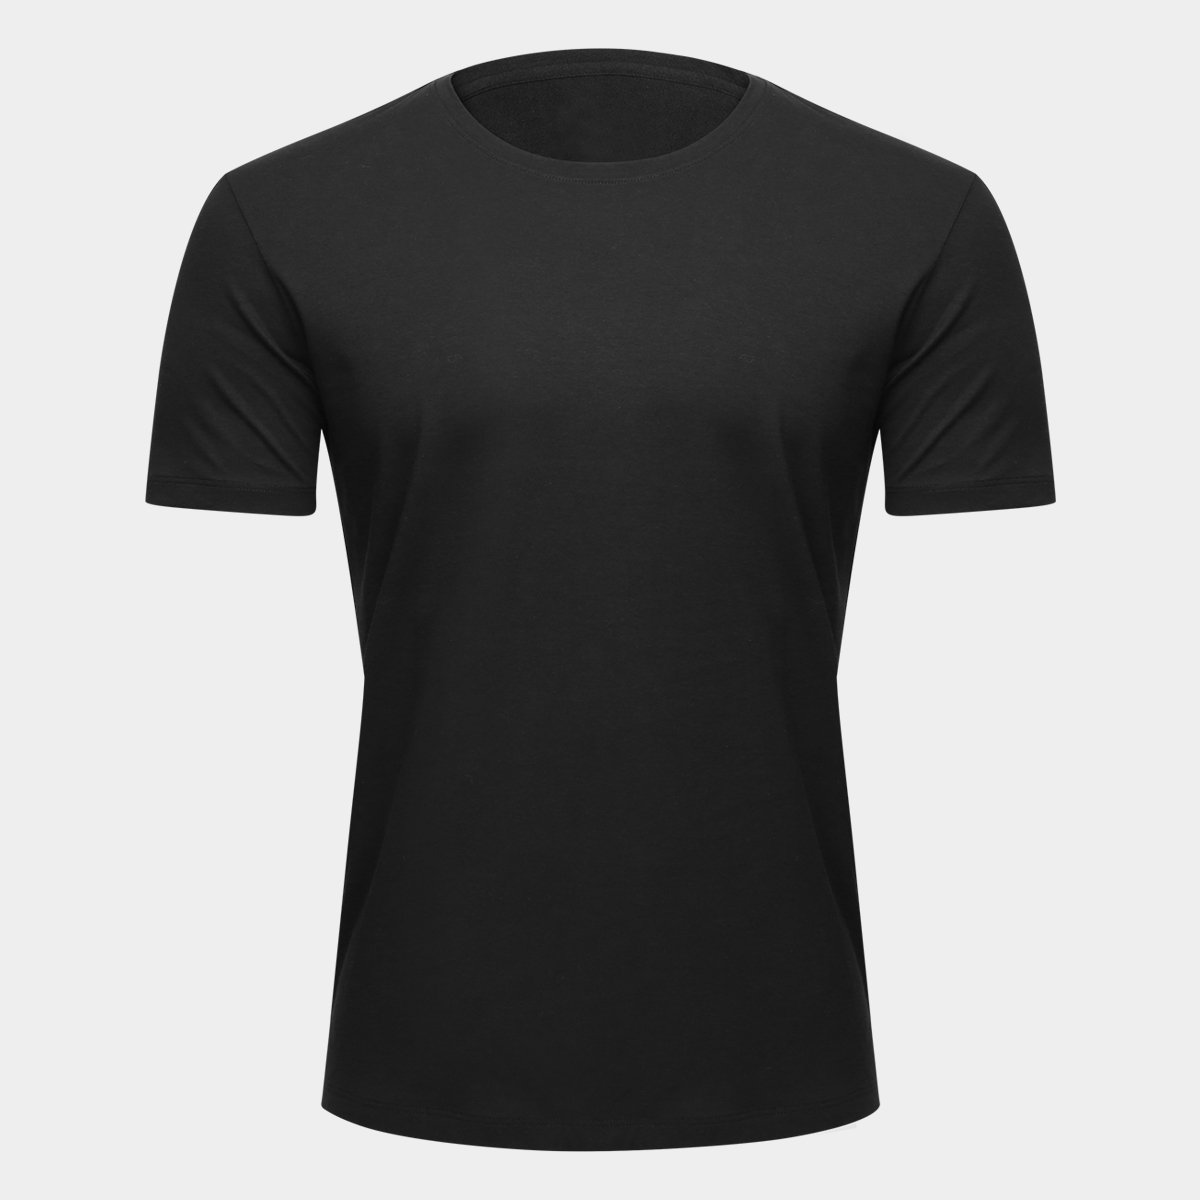 80569db549 Camiseta SPR Masculina - Preto - Compre Agora